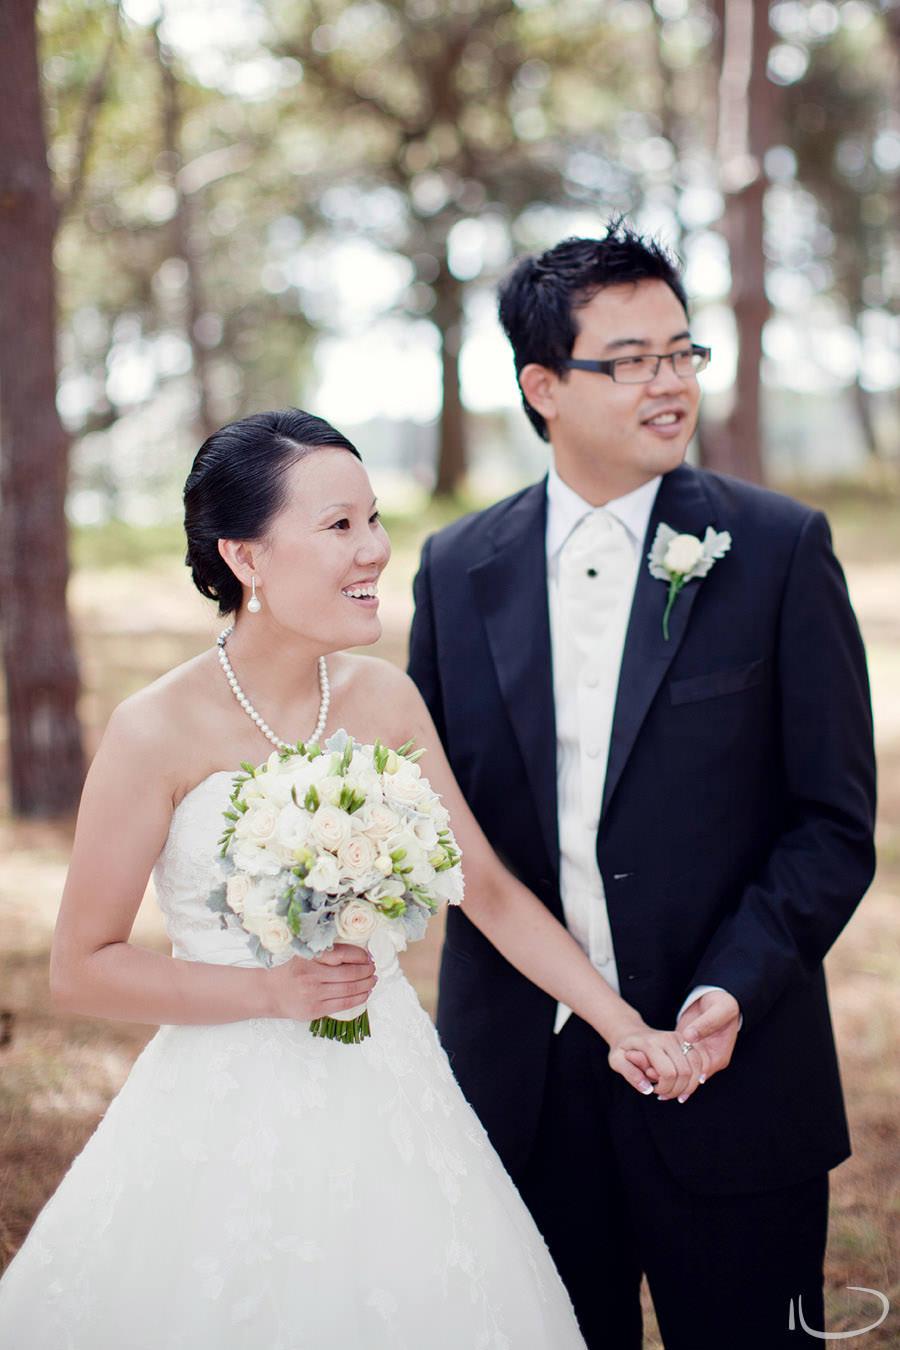 Centennial Park Wedding Photographer: Bride & Groom